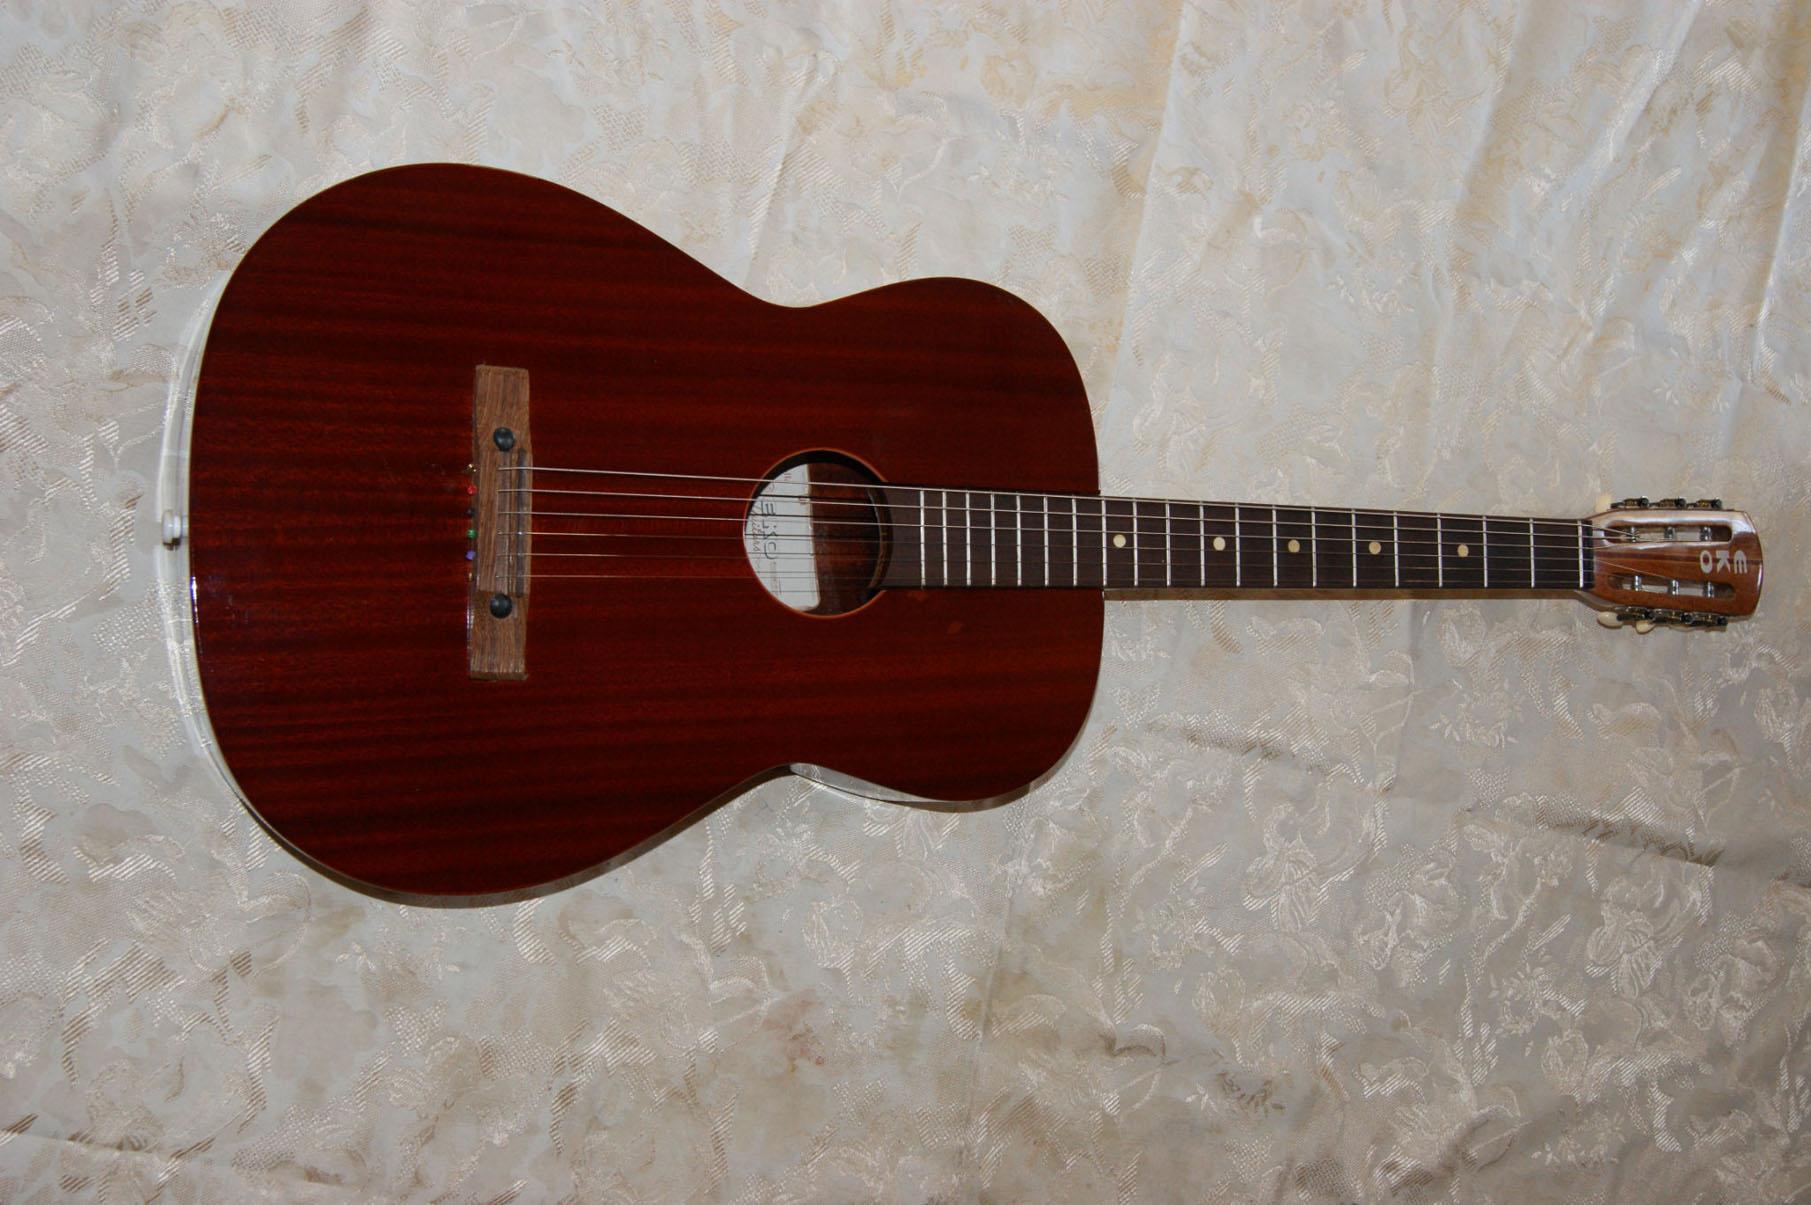 restauration guitare luthier